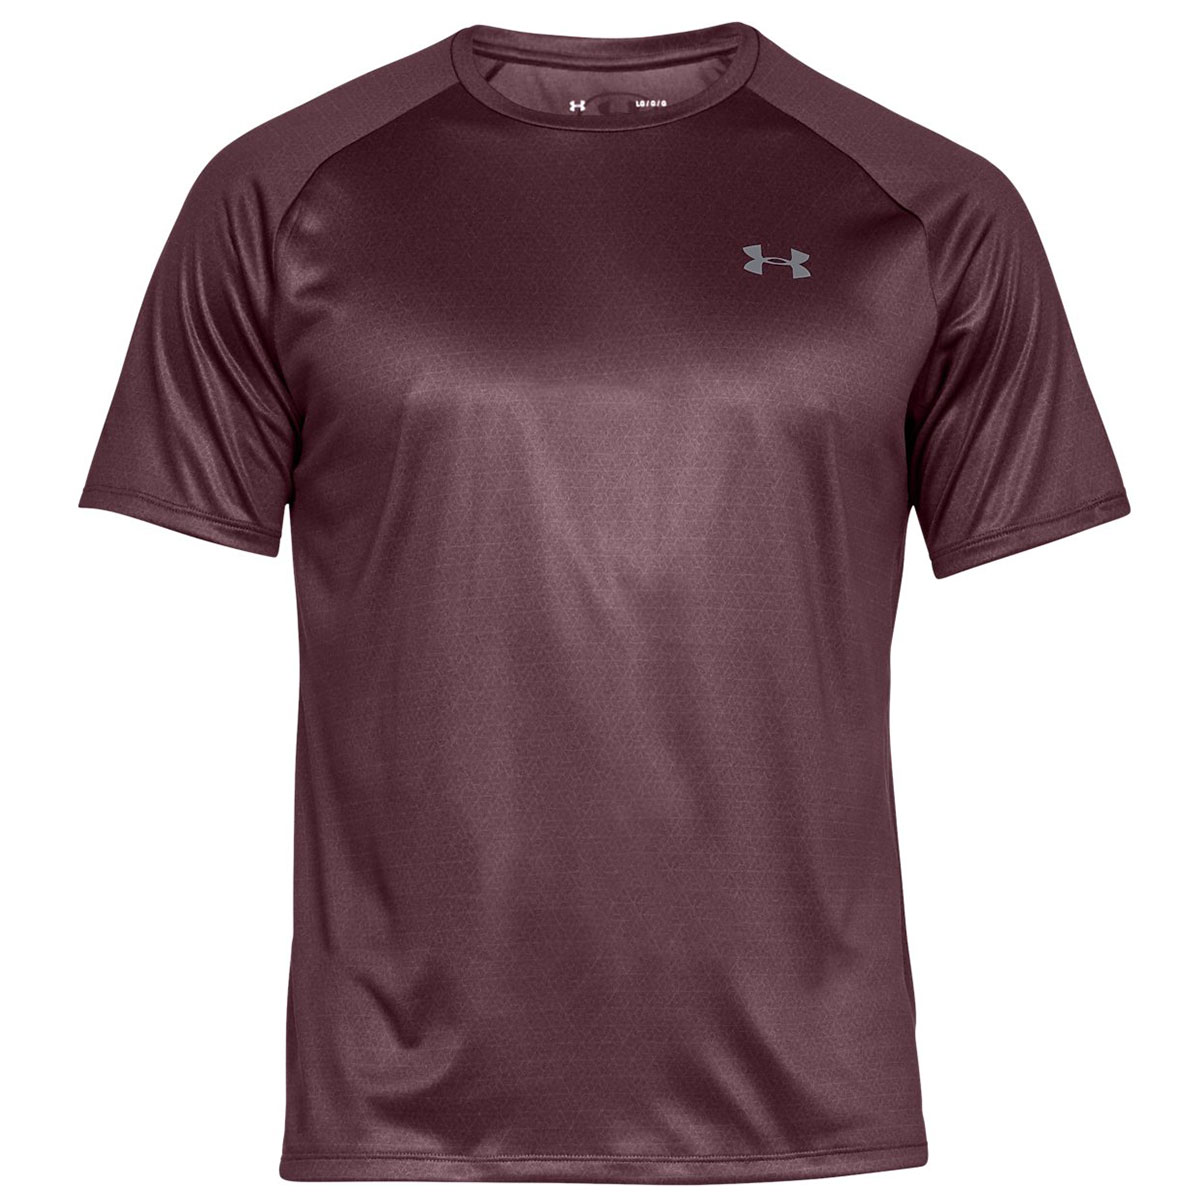 Under-Armour-Mens-UA-Tech-SS-Printed-Moisture-Wicking-T-Shirt-Tee-27-OFF-RRP thumbnail 8